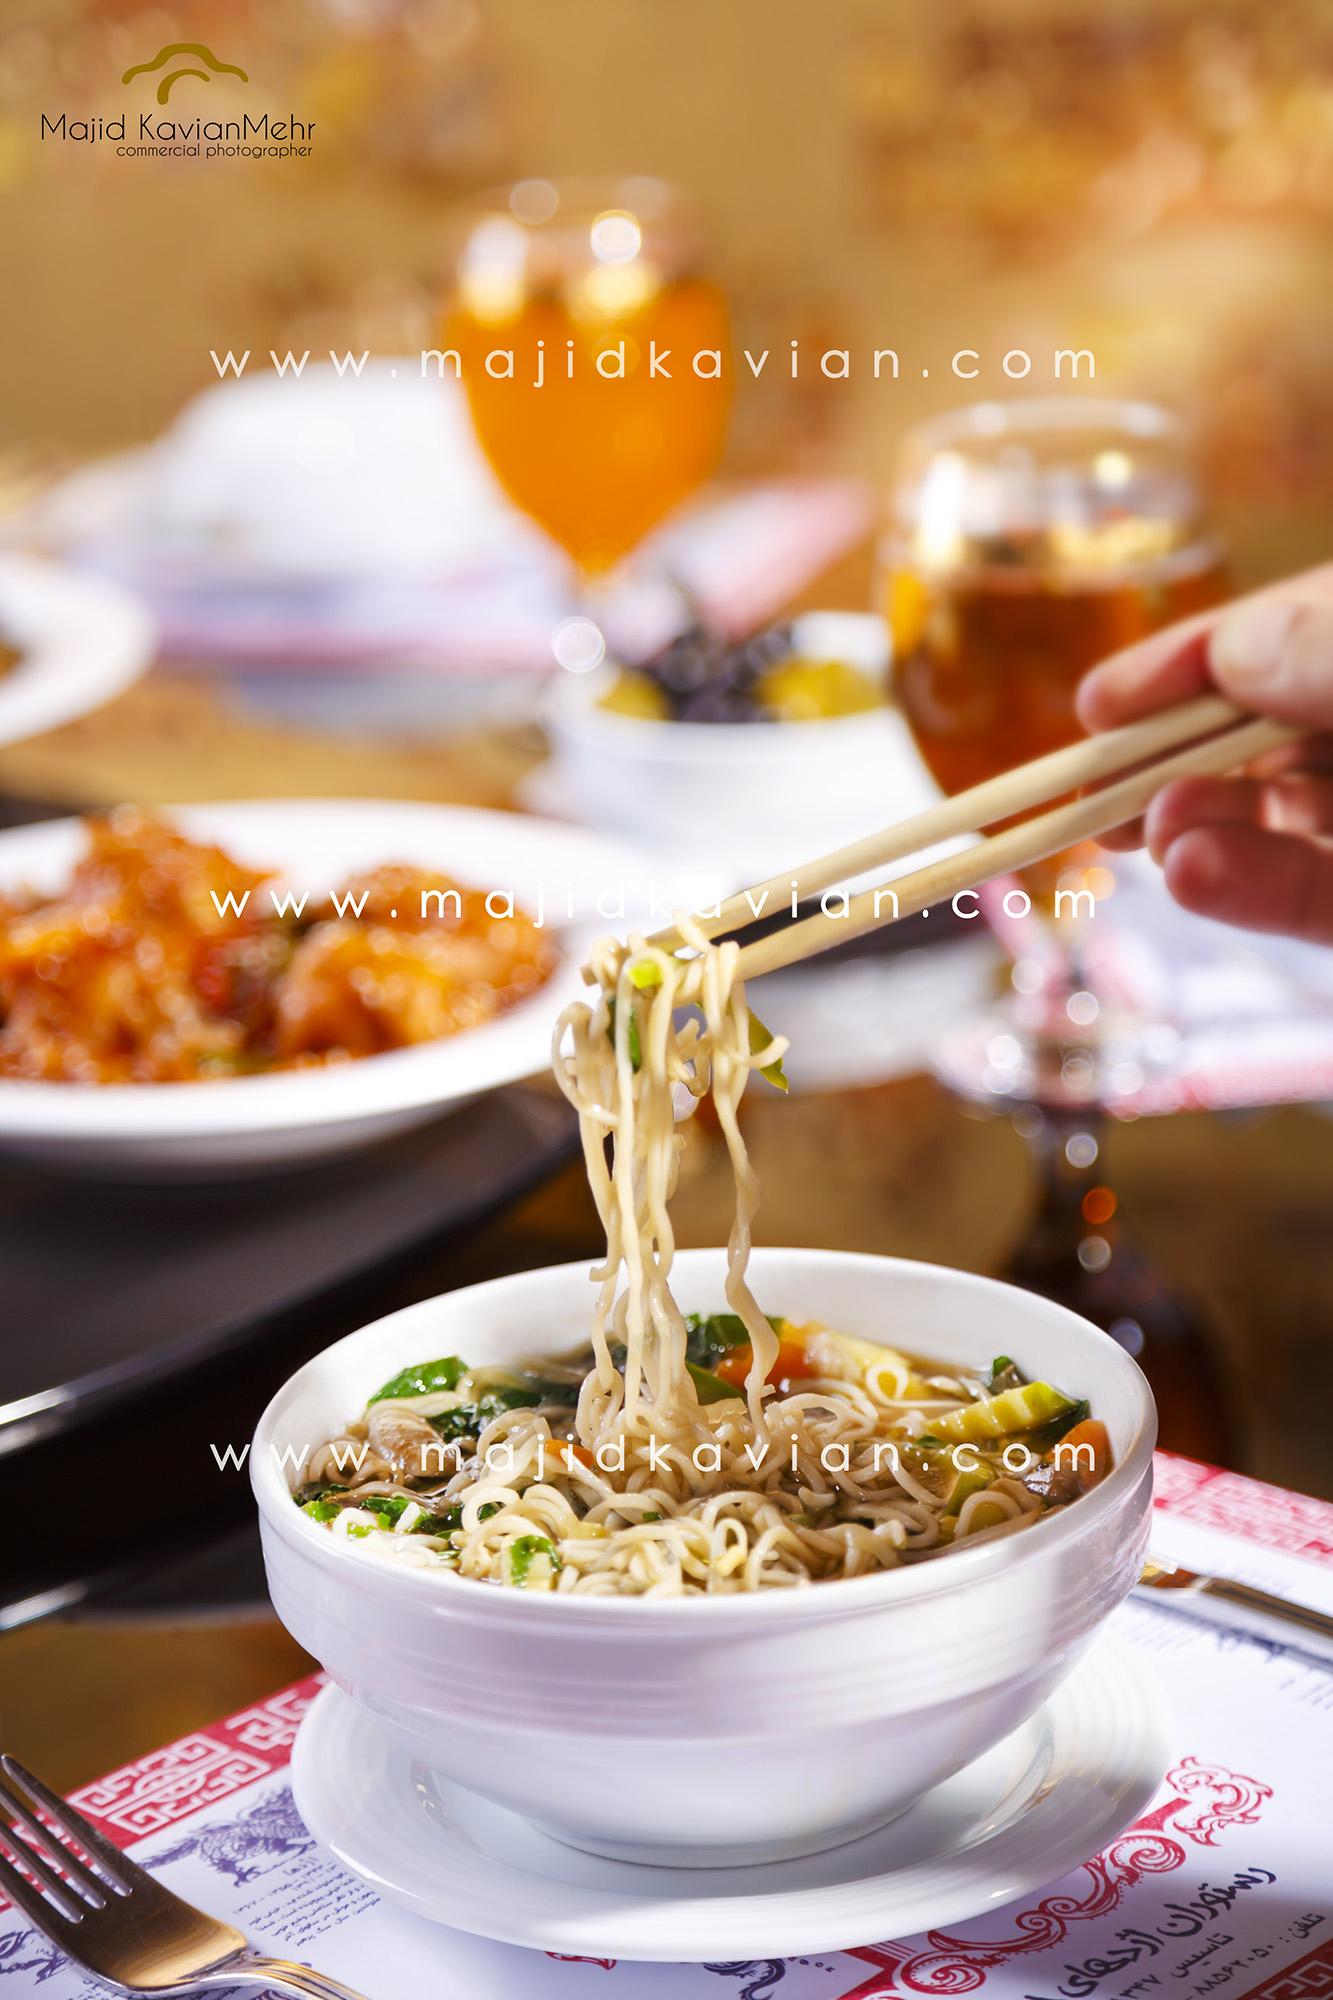 MG 9361 - عکاسی مواد غذایی و رستوران